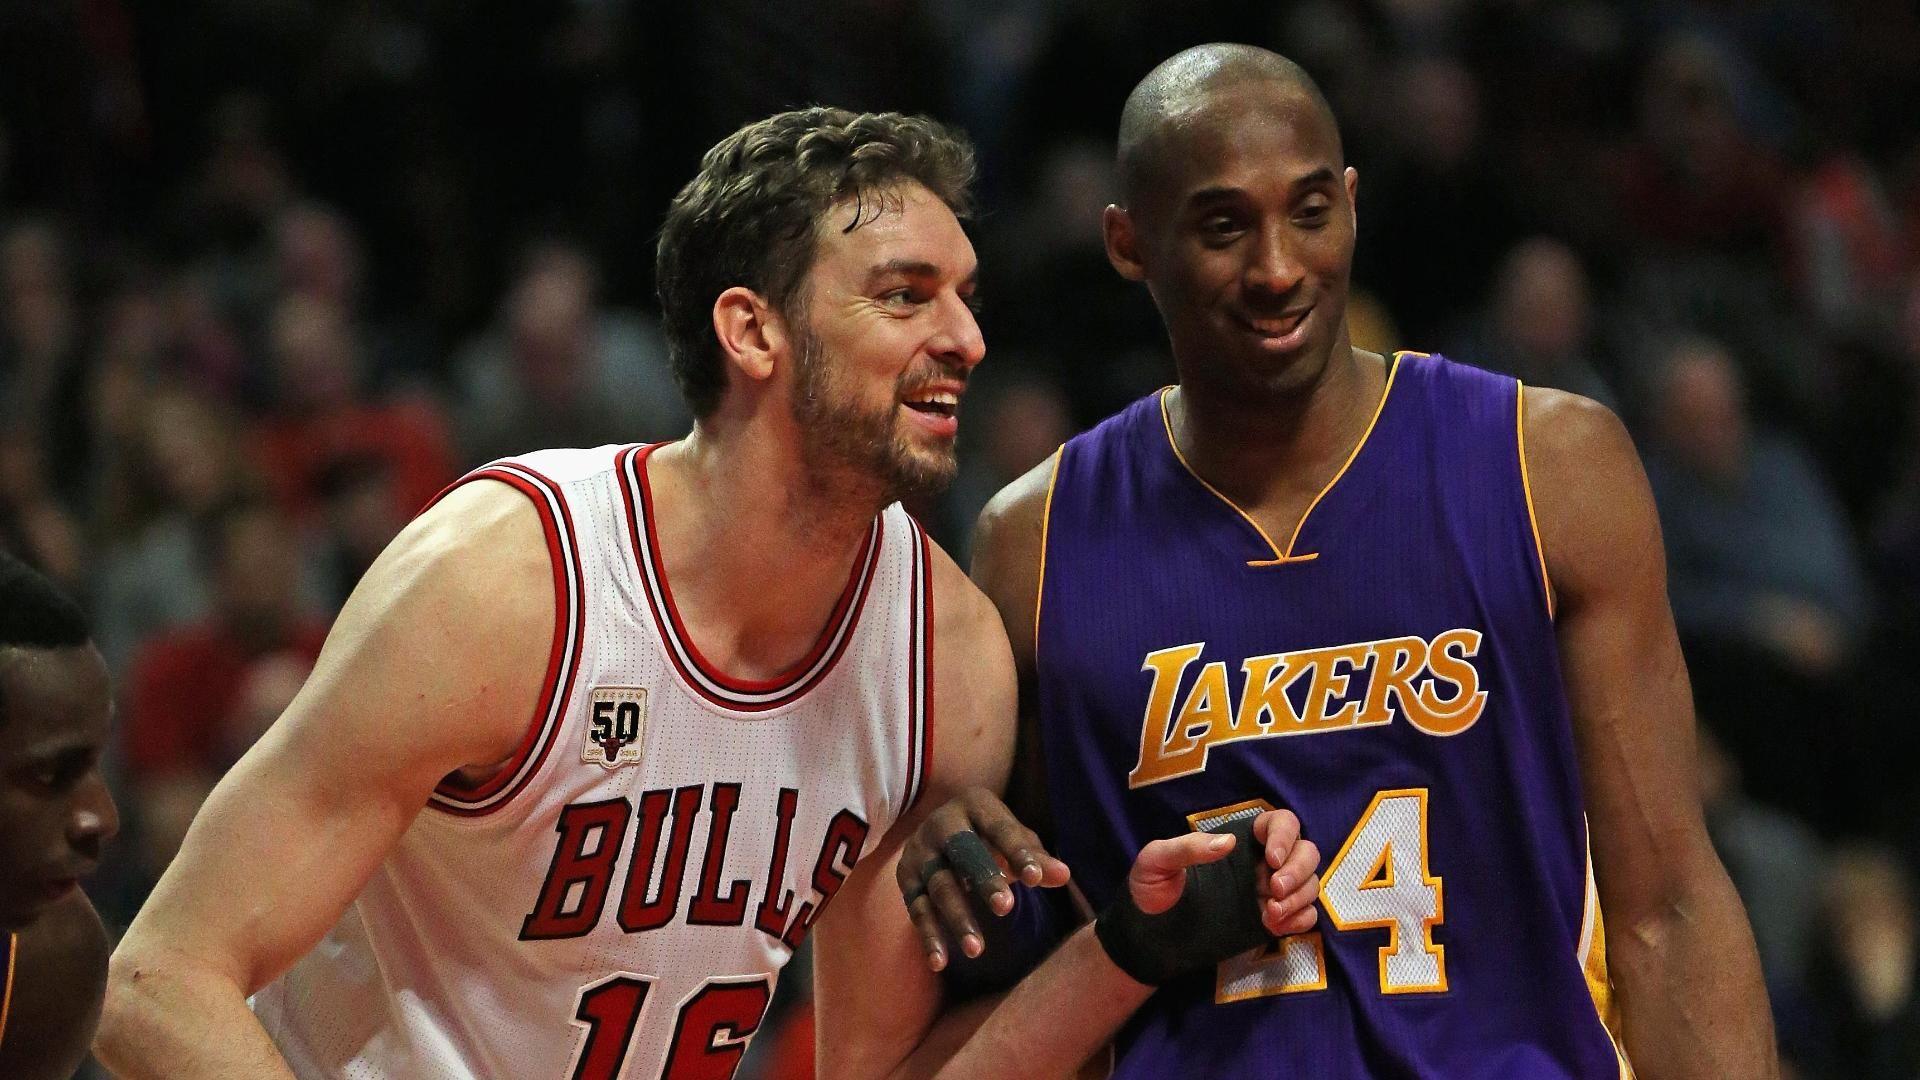 Kobe scores 22 in loss to Bulls